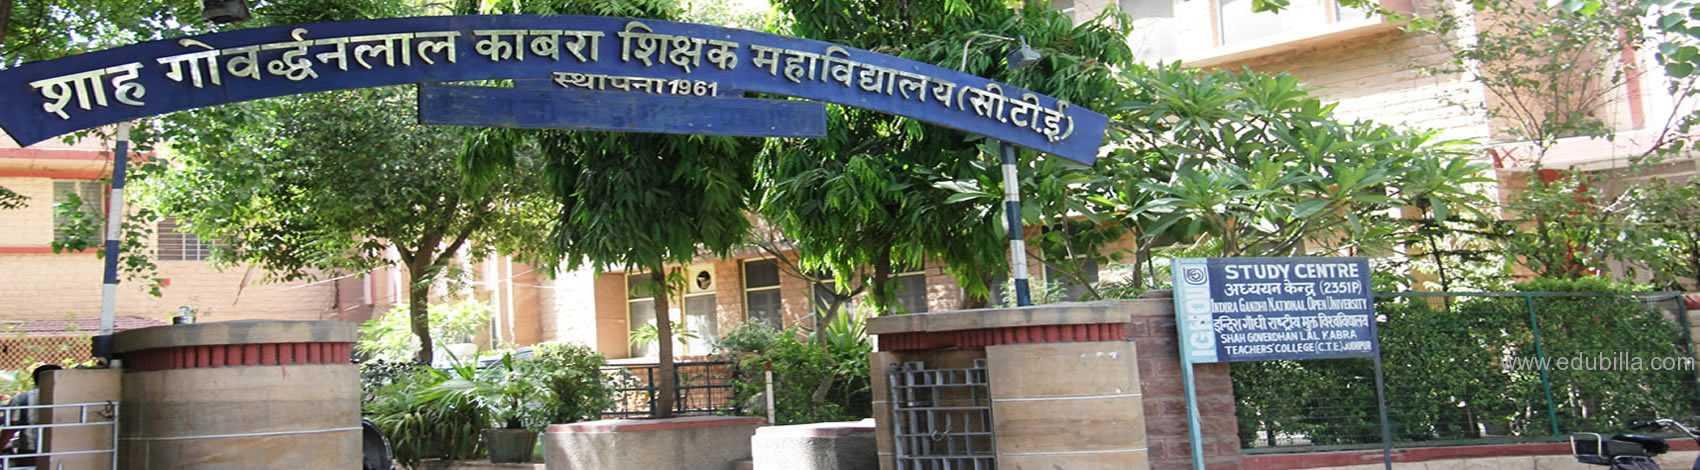 shah_goverdhan_lal_kabra_teachers_college_c.t.e._jodhpur.jpg